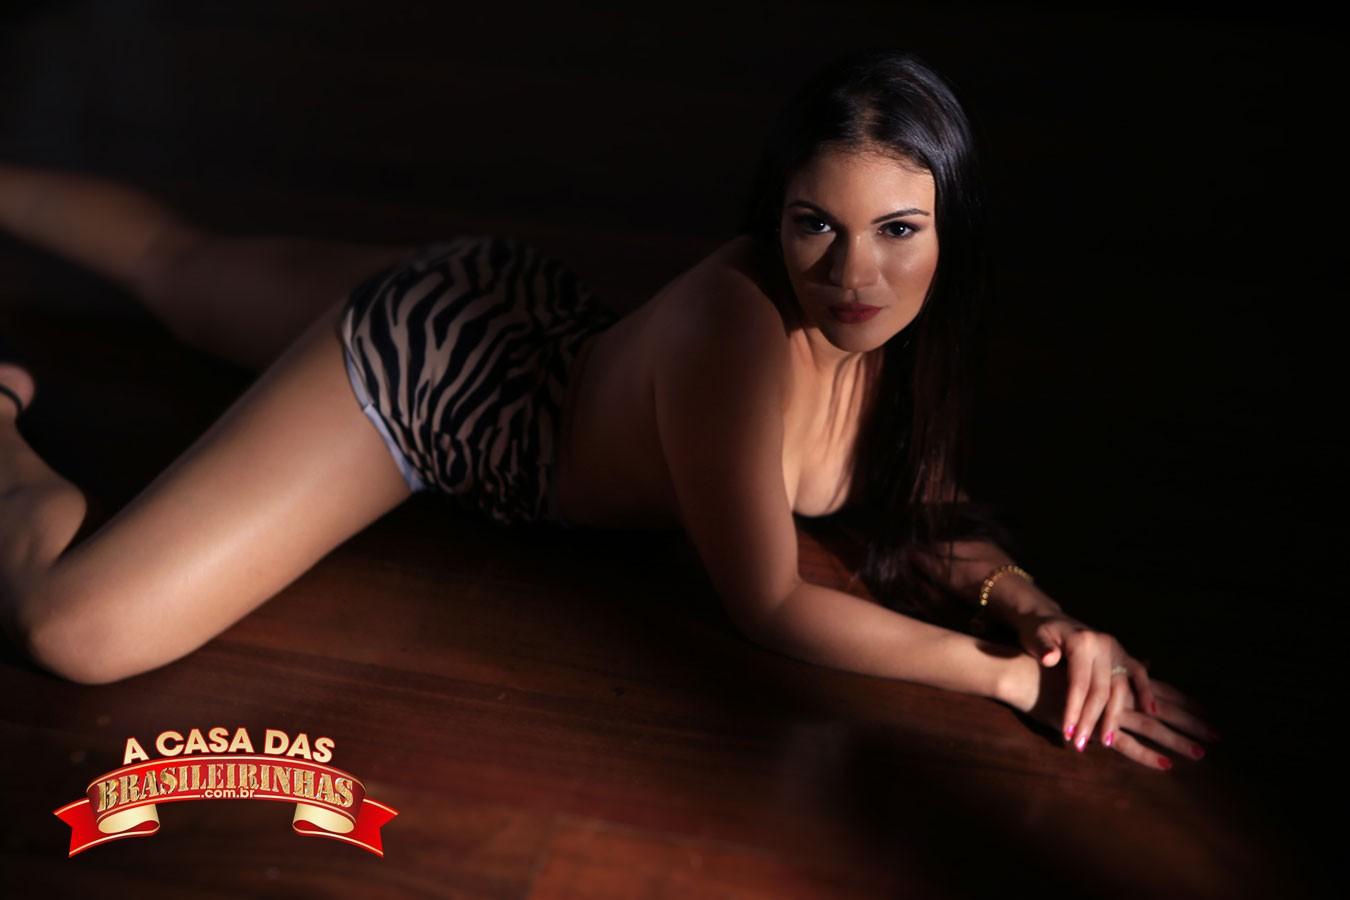 ensaio-sensual-de-Taynar-Torres.jpg